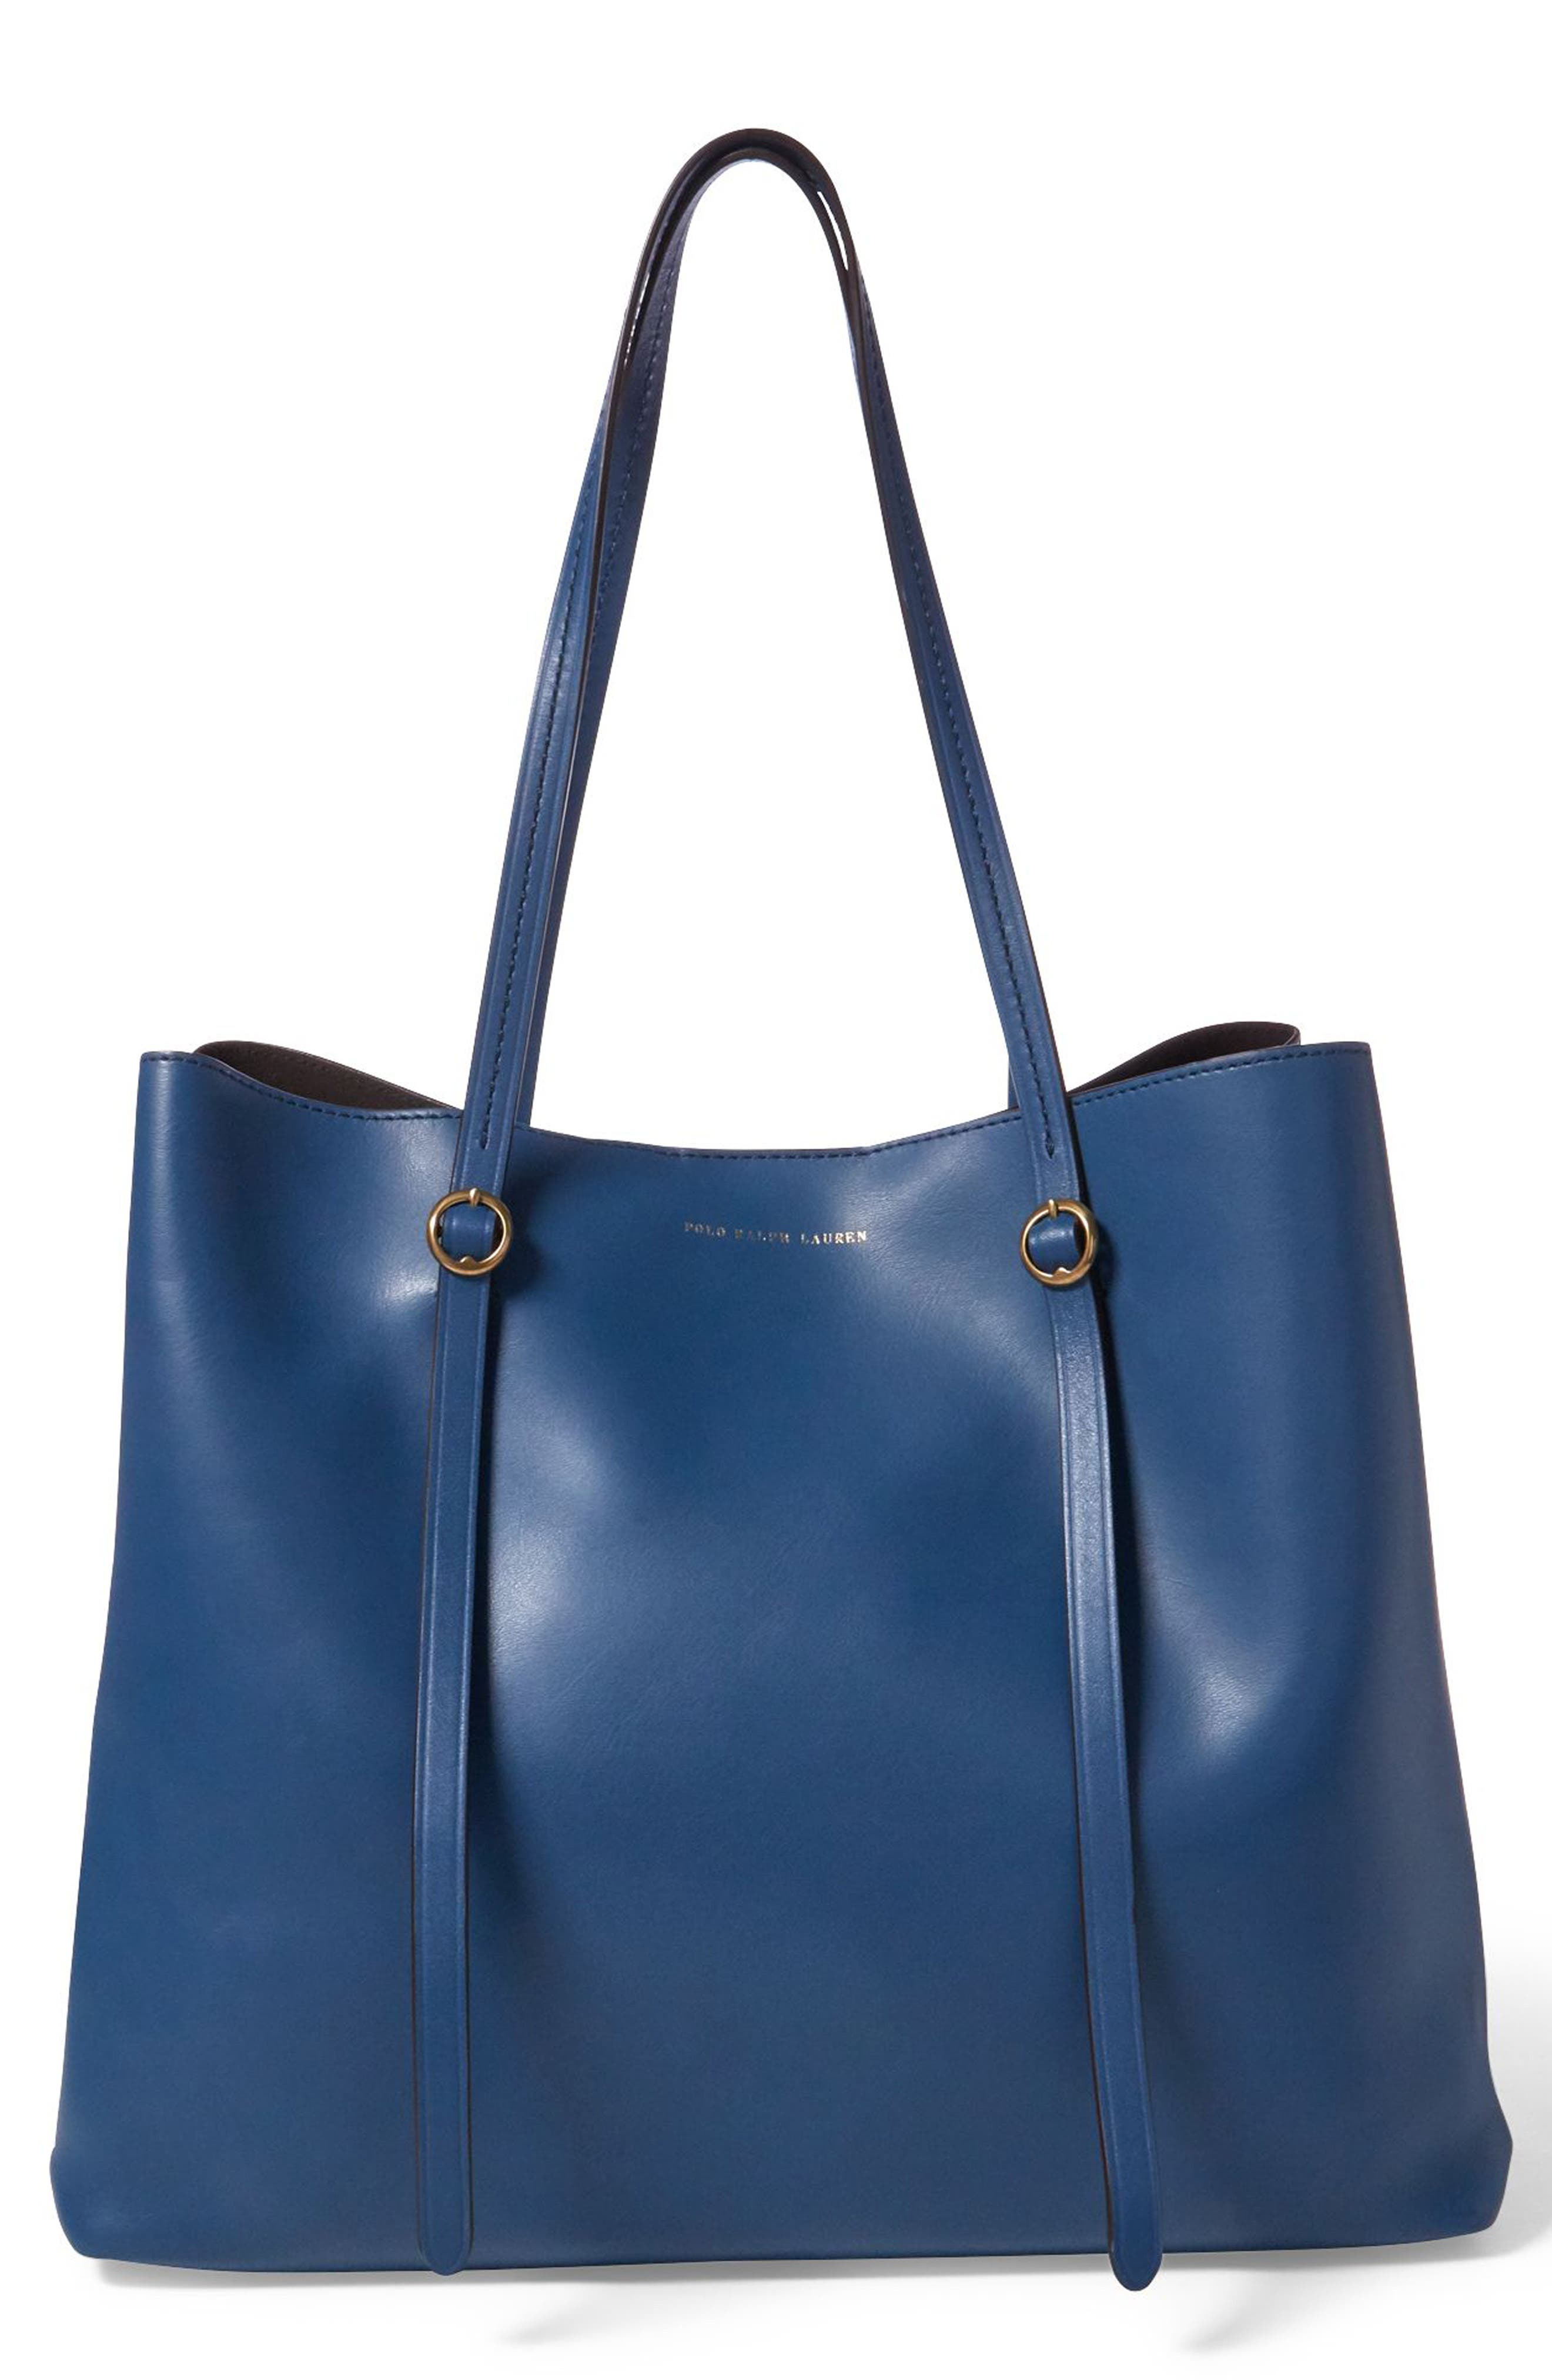 259918768704 Polo Ralph Lauren Lennox Leather Tote - Blue In Denim Blue ...